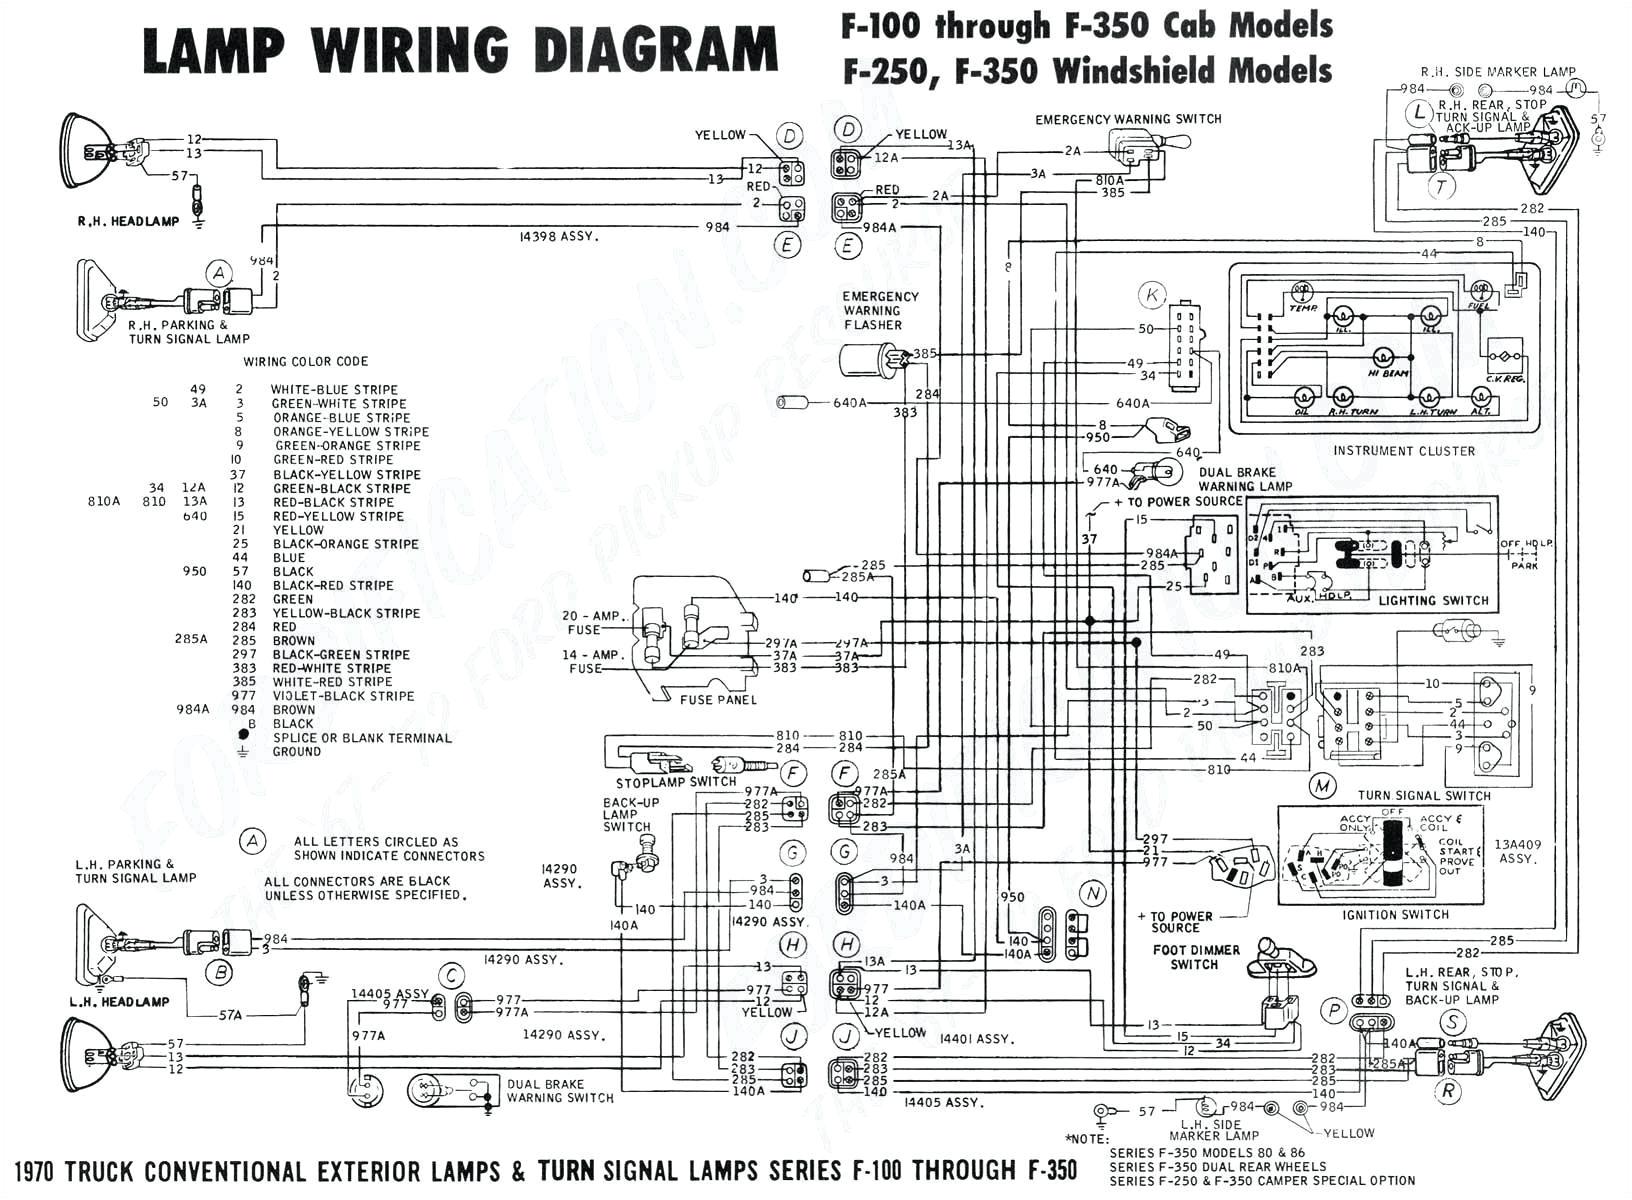 Panasonic Cq-rx100u Wiring Diagram Wiring Panasonic Diagram 15200218 Wiring Diagram Preview